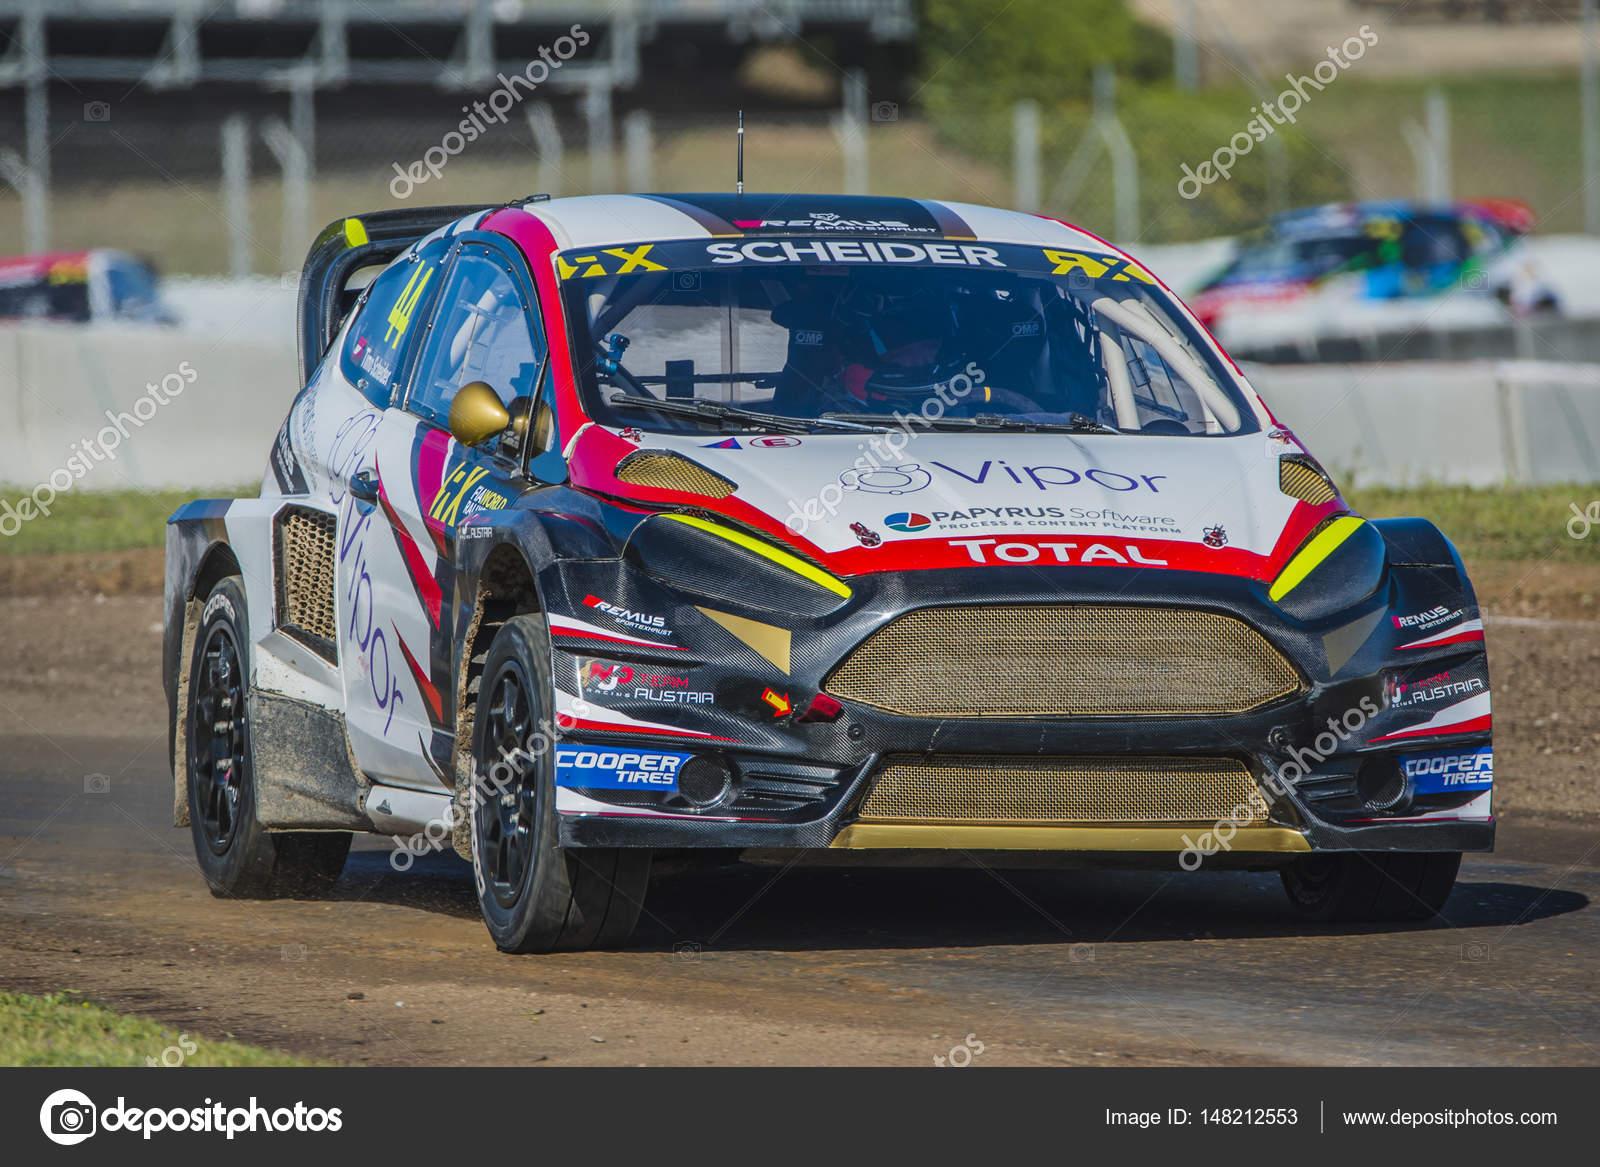 Timo Scheider. Barcelona FIA World Rallycross – Stock Editorial ...